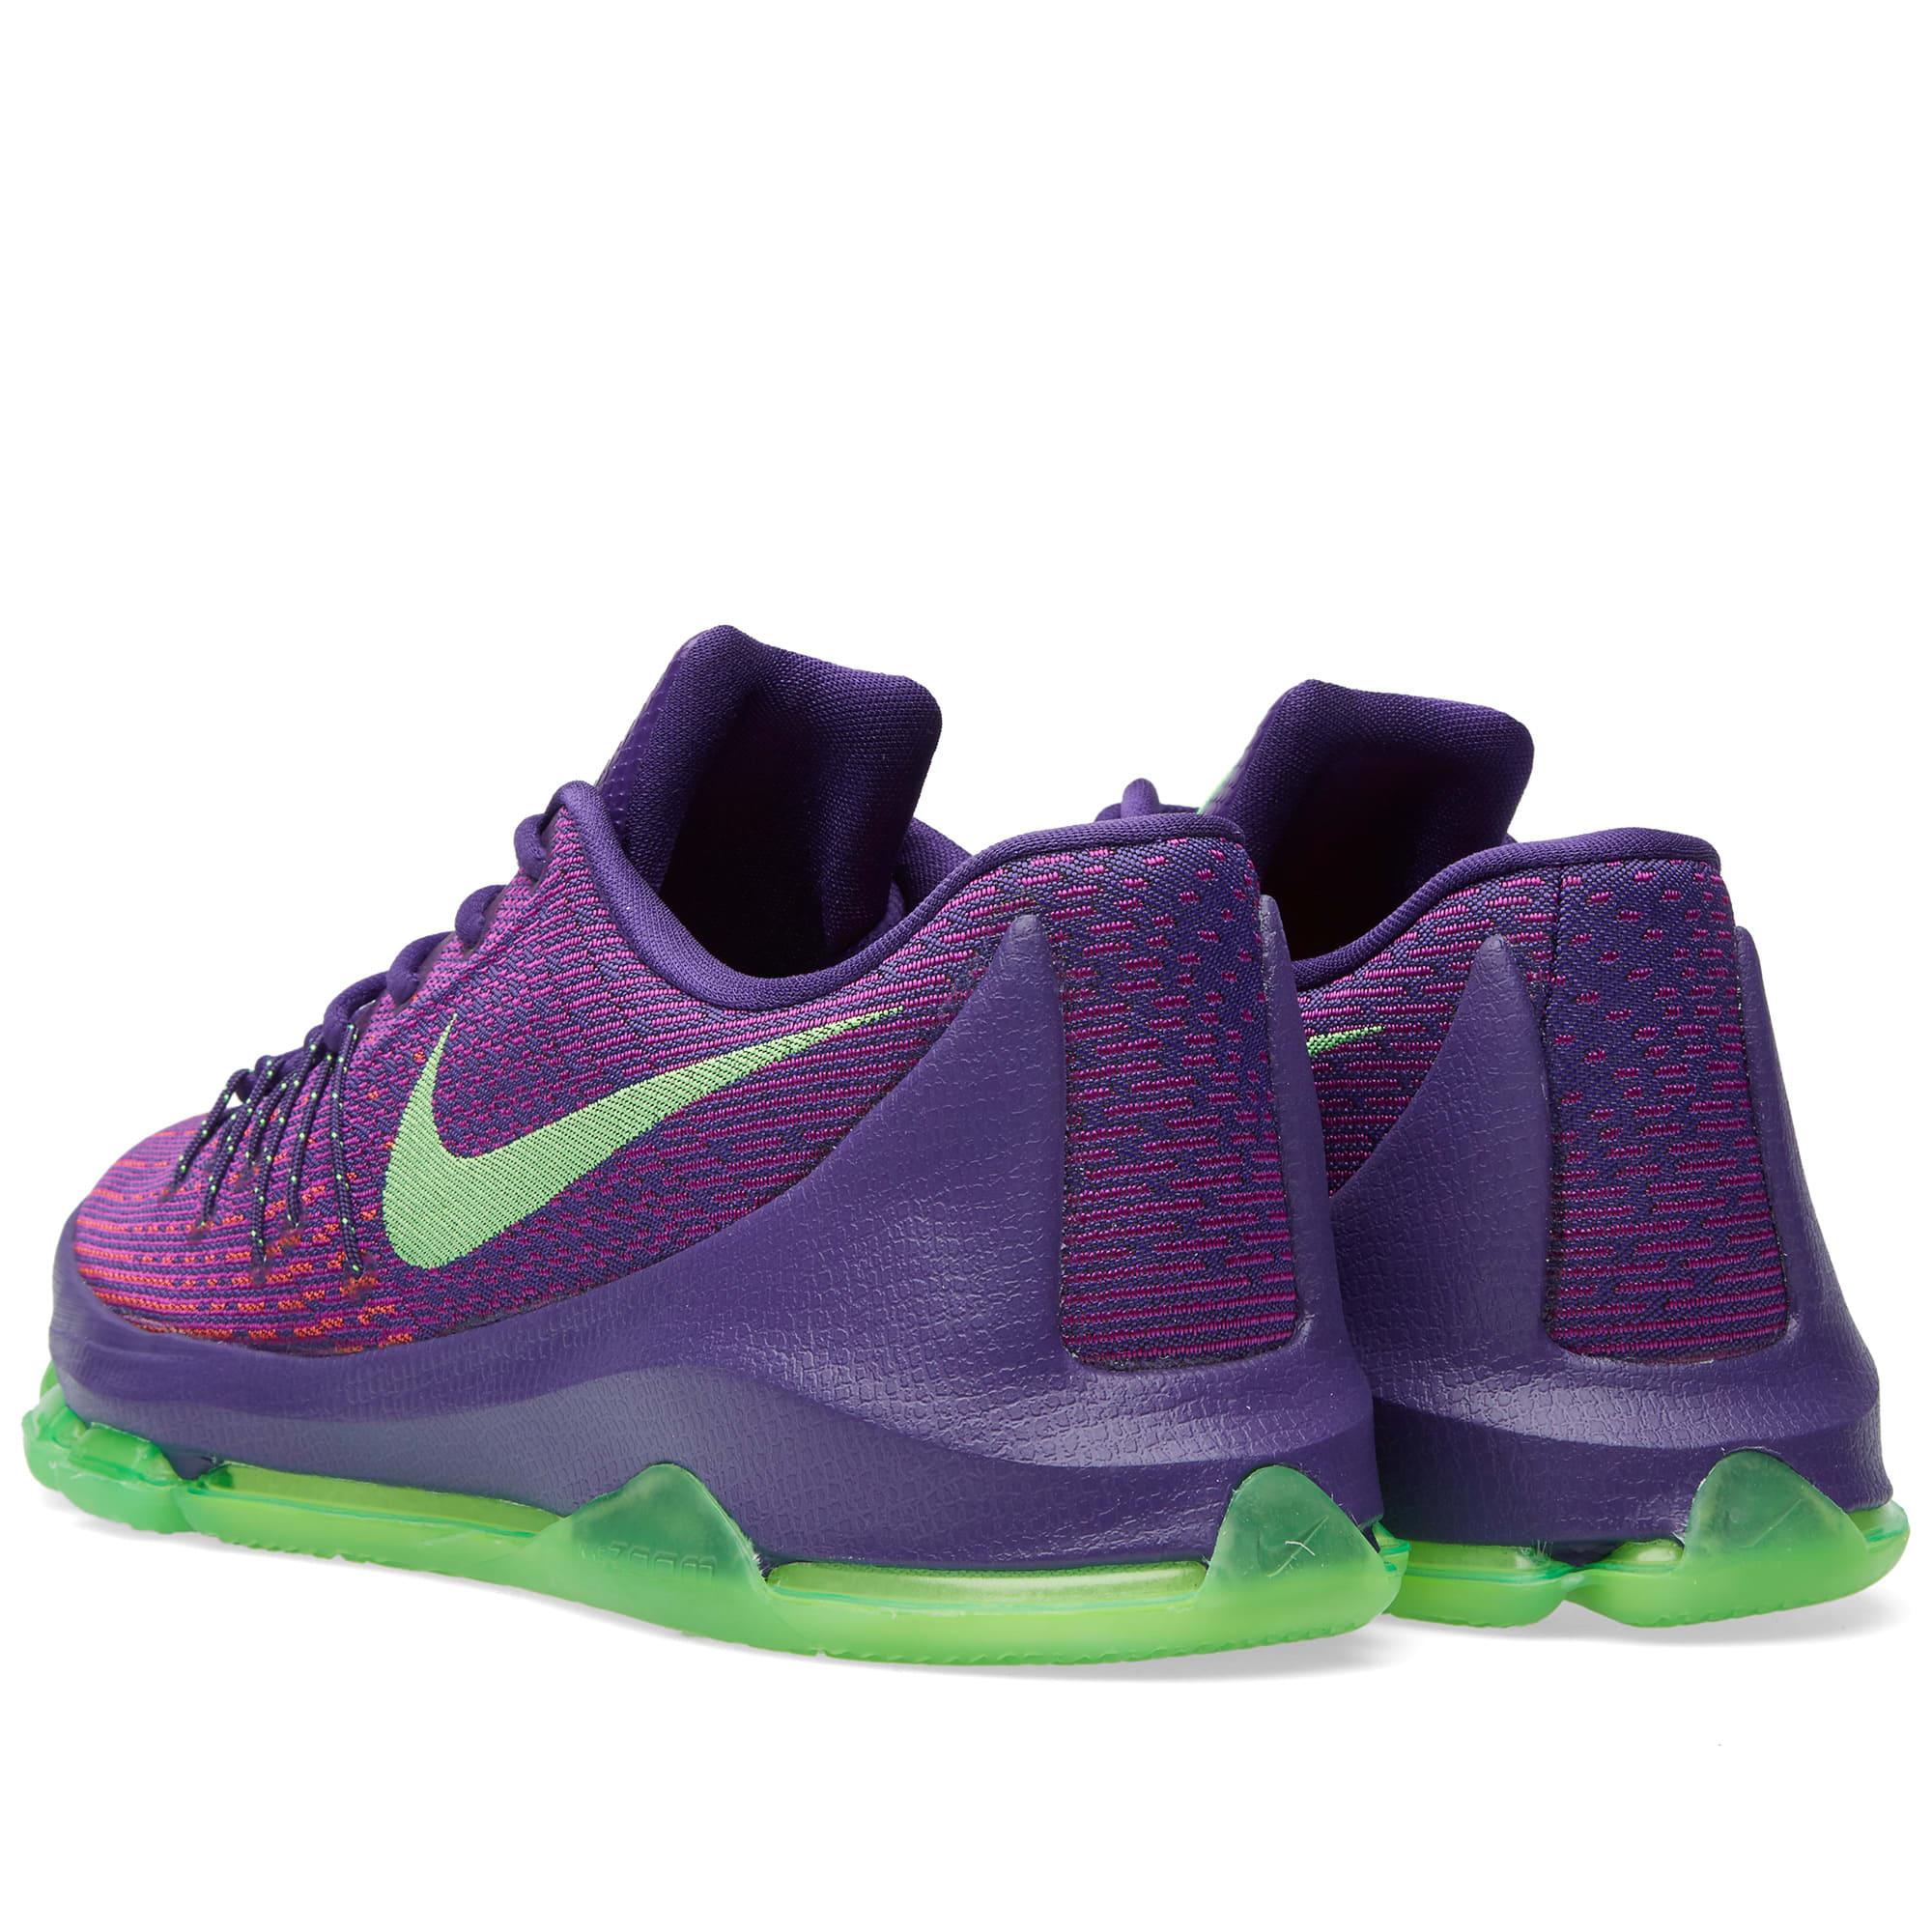 official photos f4ccf 20043 Nike KD 8  Suit  Court Purple   Green Strike   END.